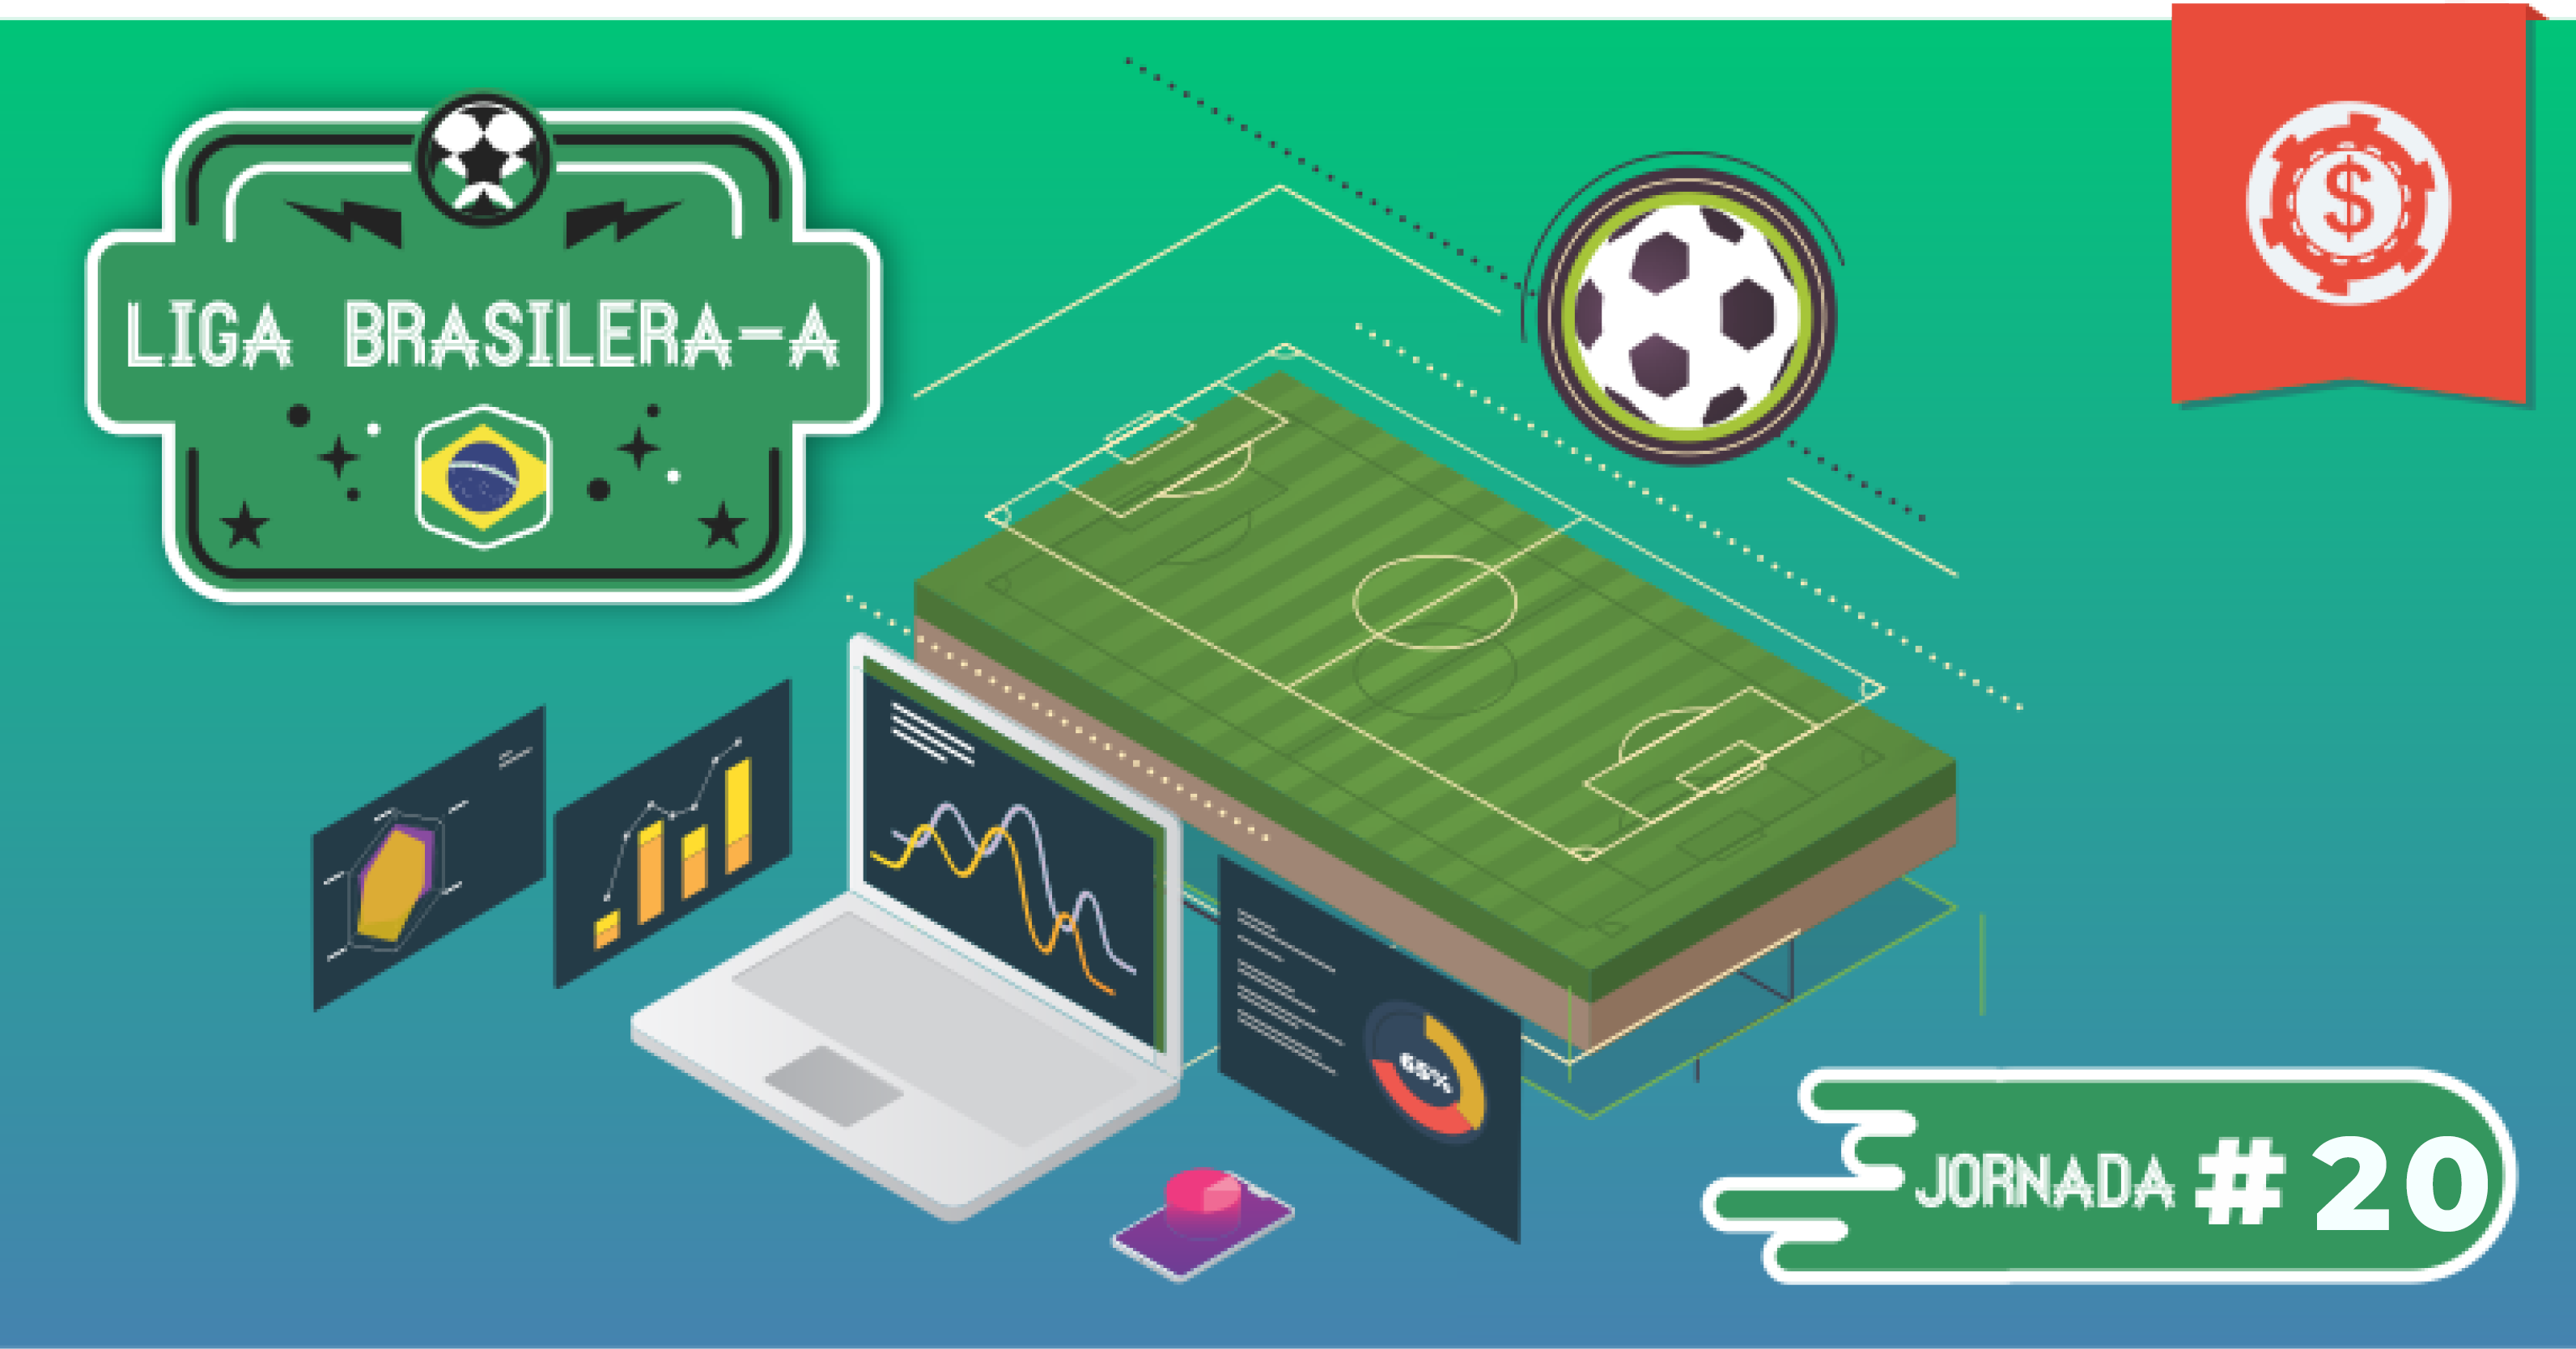 pronosticos-liga-brasilera-primera-division-apuestas-jornada-20